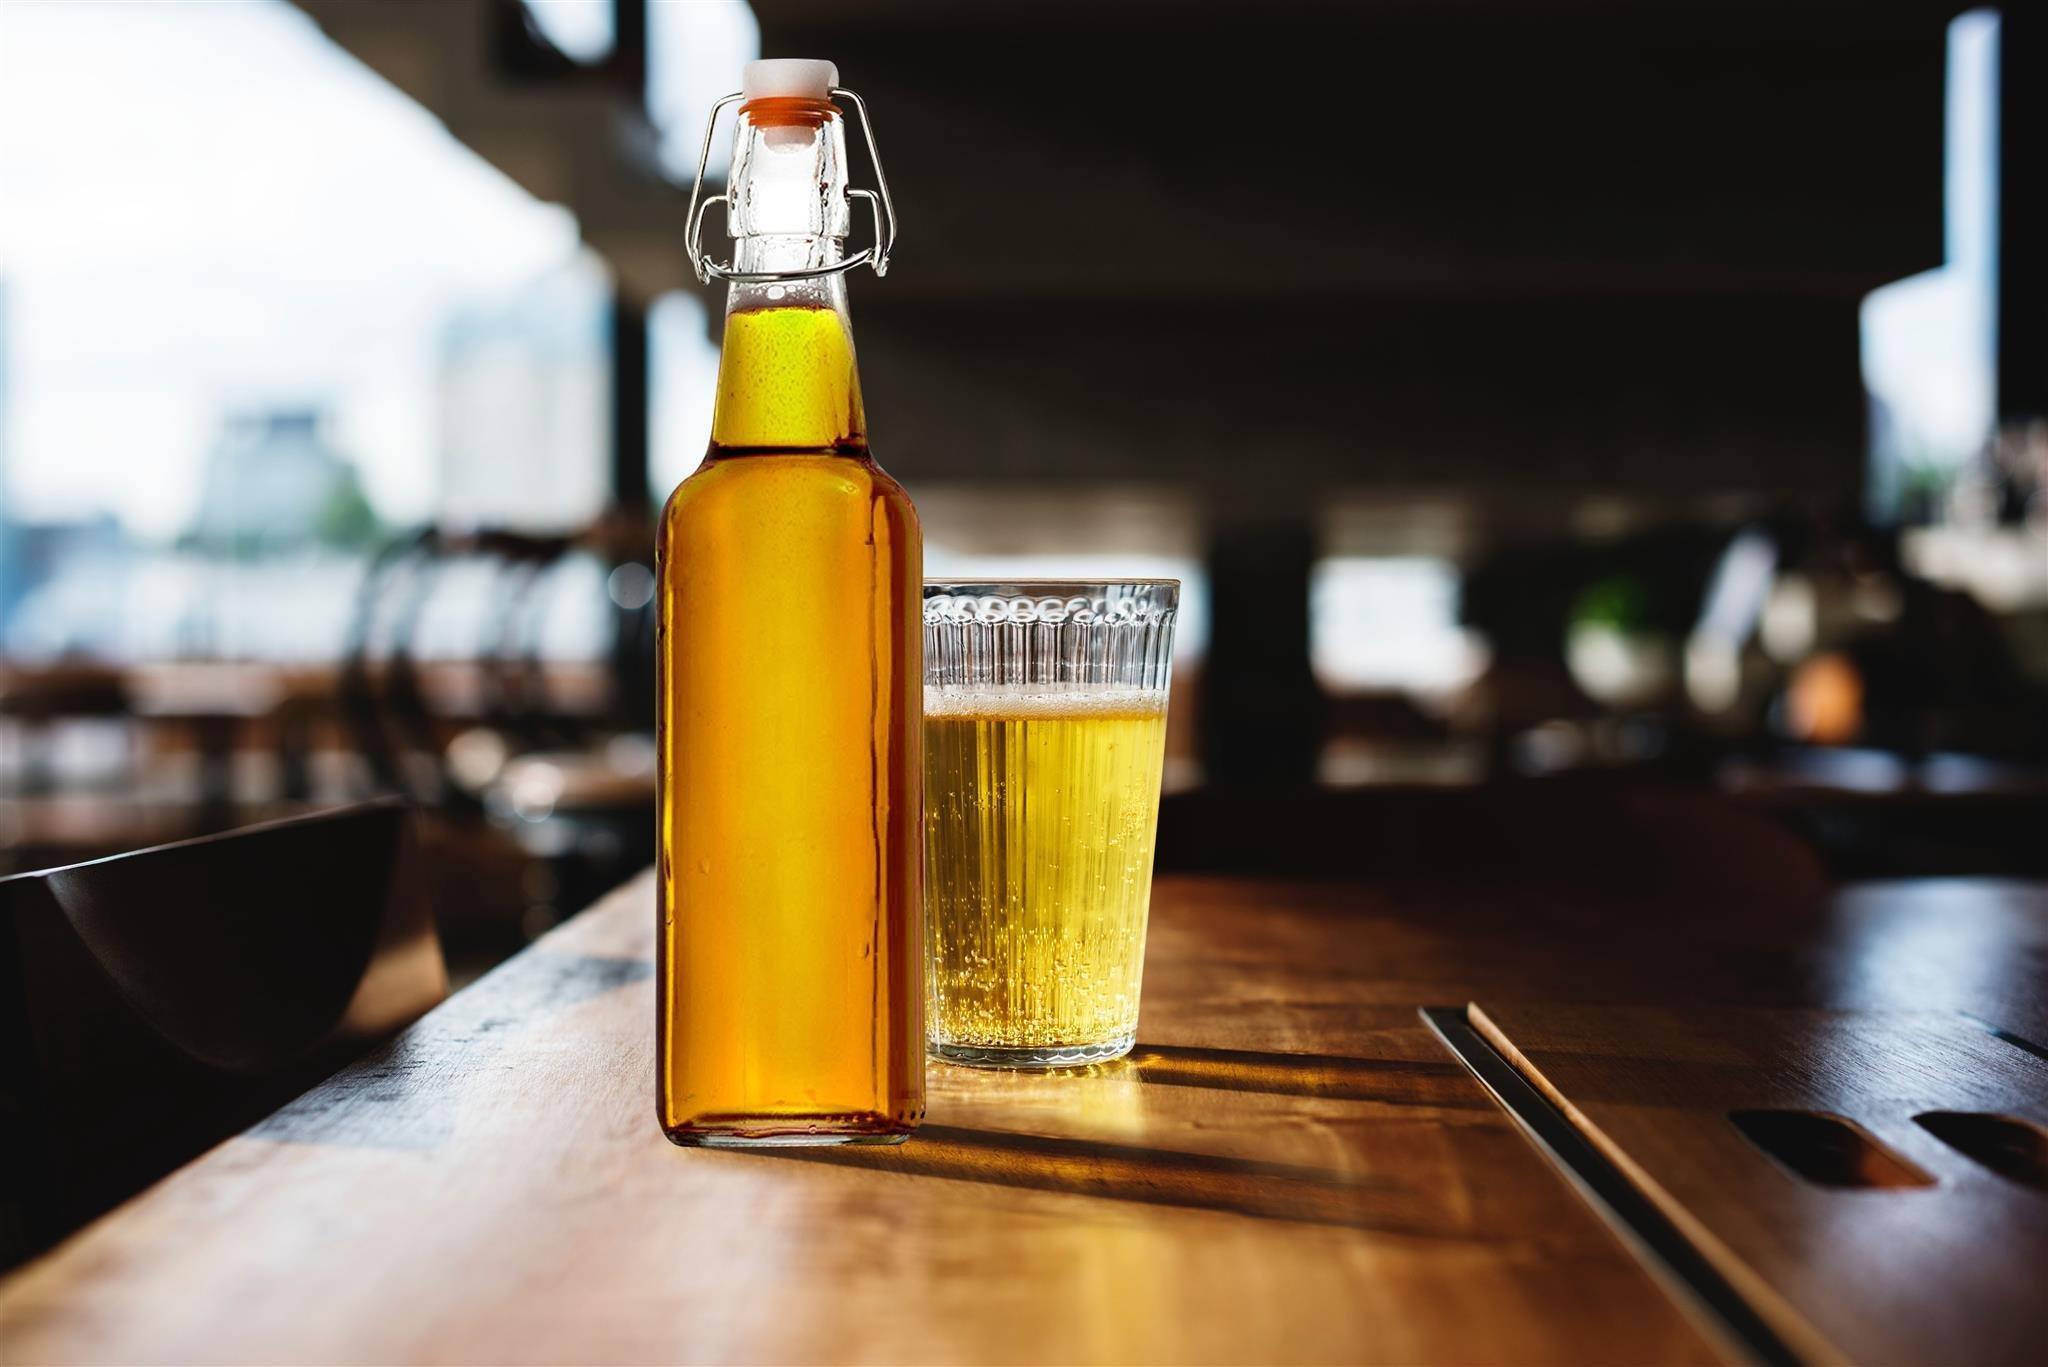 Zuzoro Glass Kombucha Bottles For Home Brewing Kombucha Kefir or Beer - 16 oz Clear Glass Grolsch Bottles case of 6 w/ Easy Swing top Cap w/ Gasket Seal Tight by Zuzuro (Image #7)